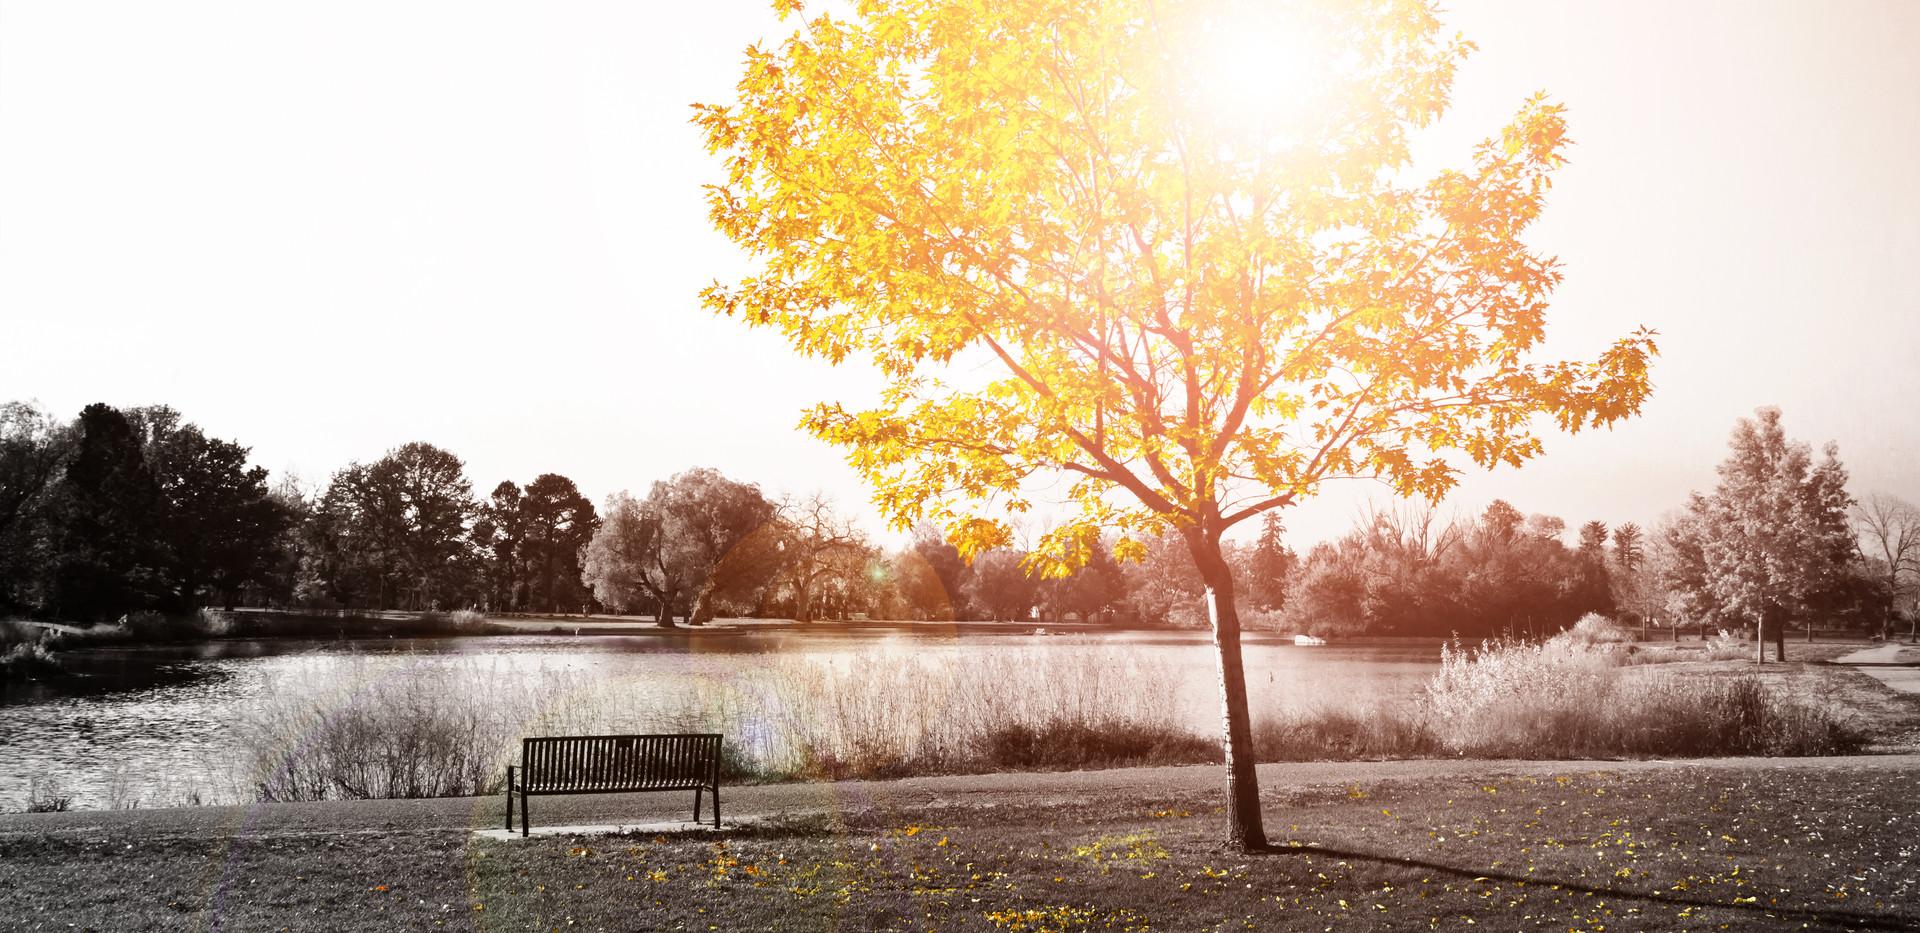 Sunlight shine on empty park bench under